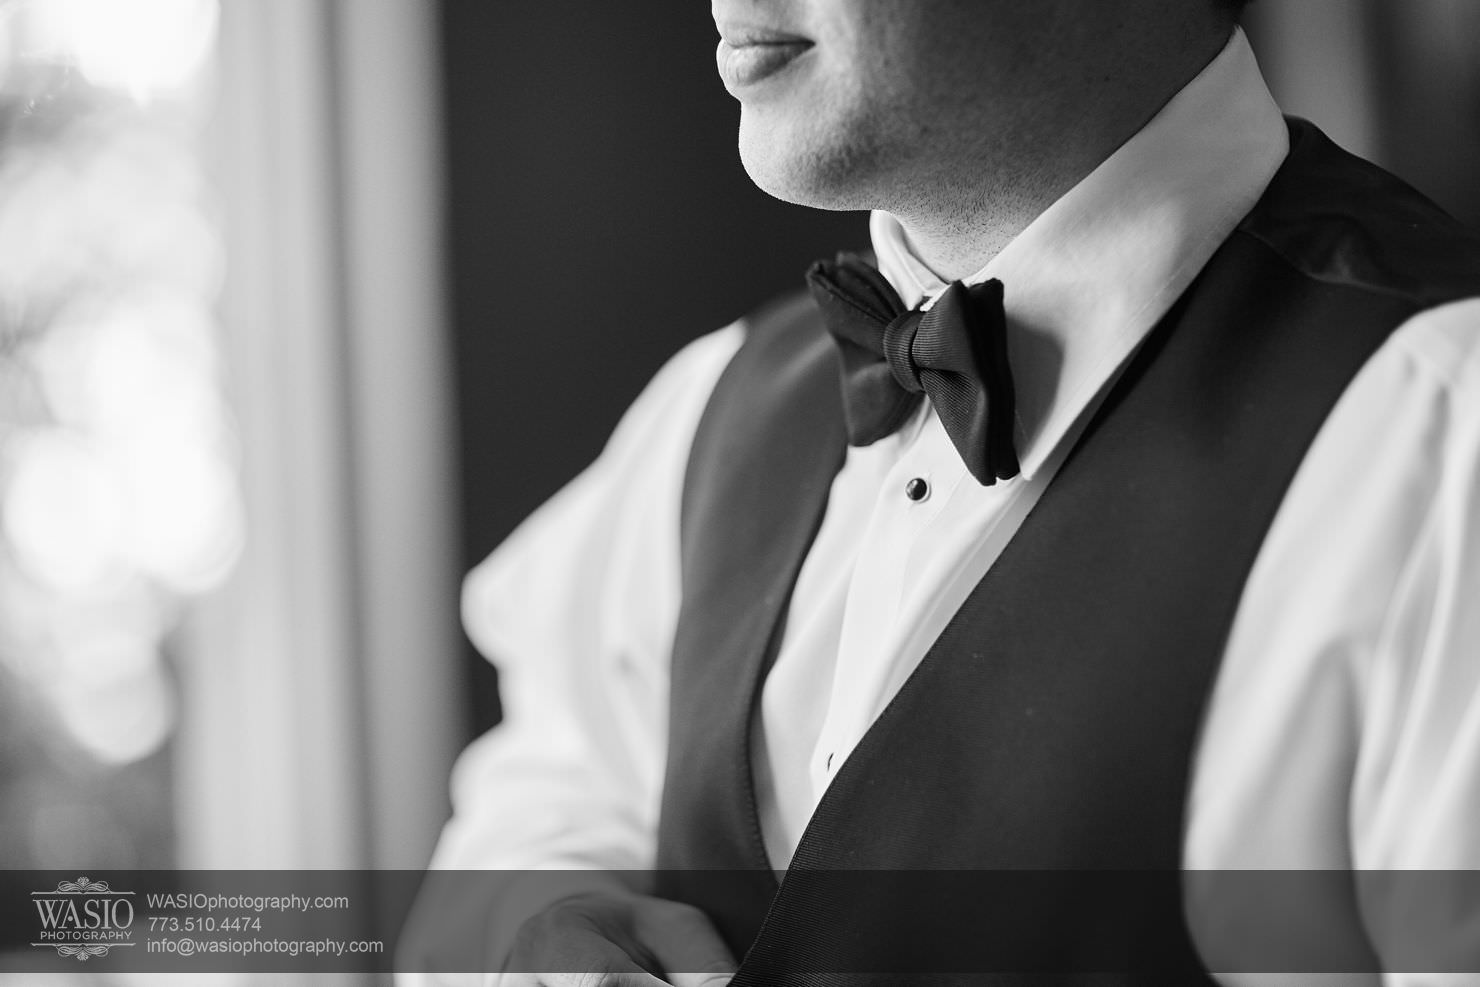 013_Chicago-Spring-Wedding_Chrissy-Andrew_3P4C4990 Chicago Spring Wedding - Chrissy + Andrew